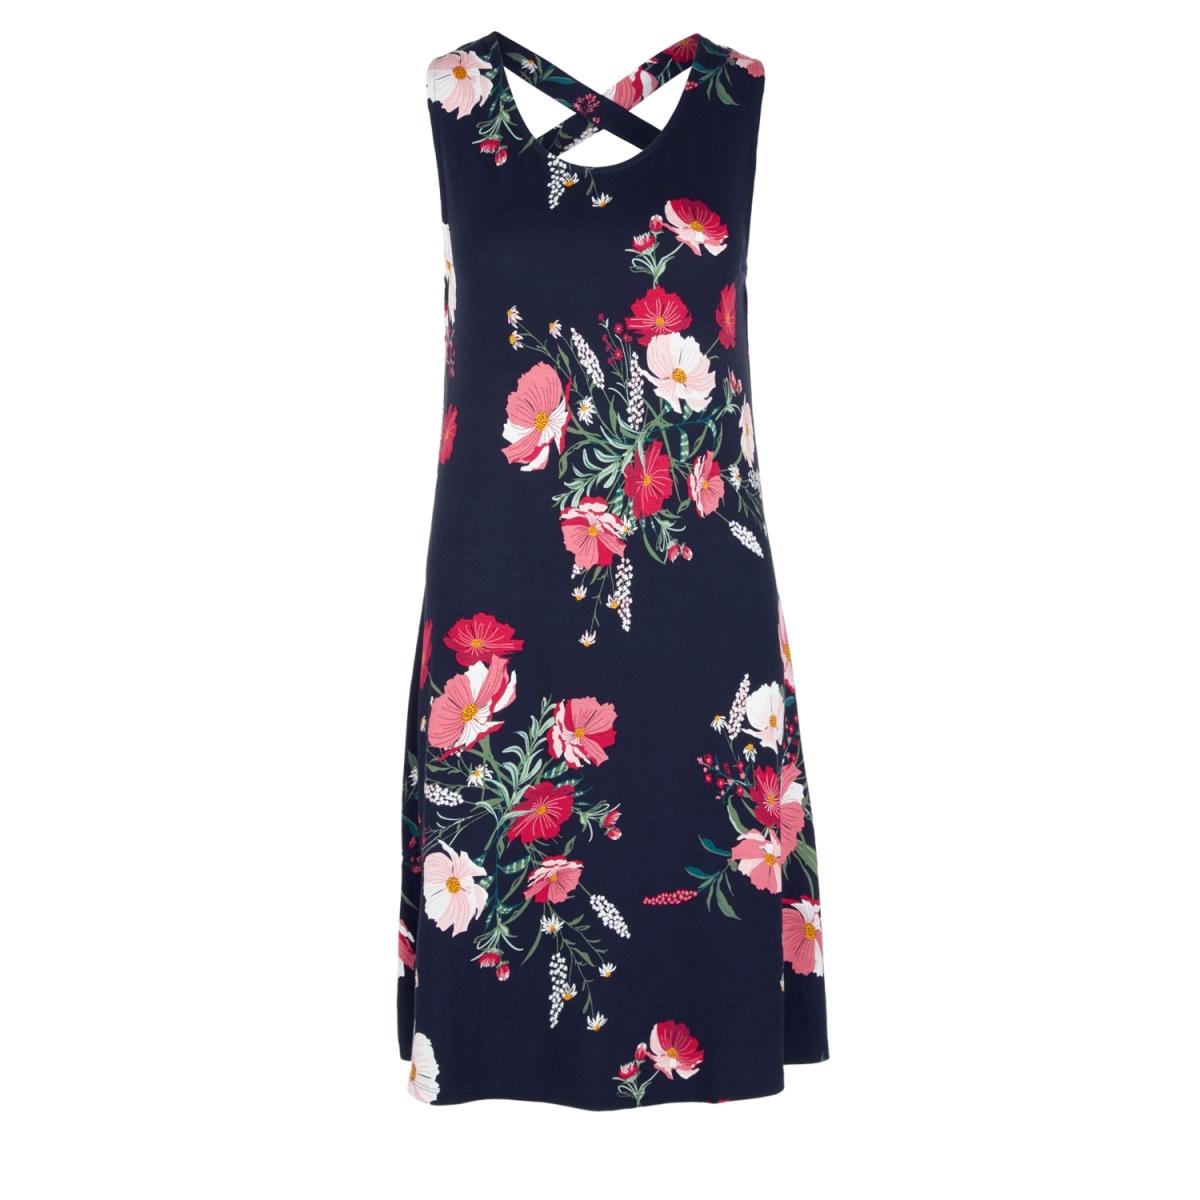 jurk met all over bloemenprint 05907823490 s.oliver jurk 59b2